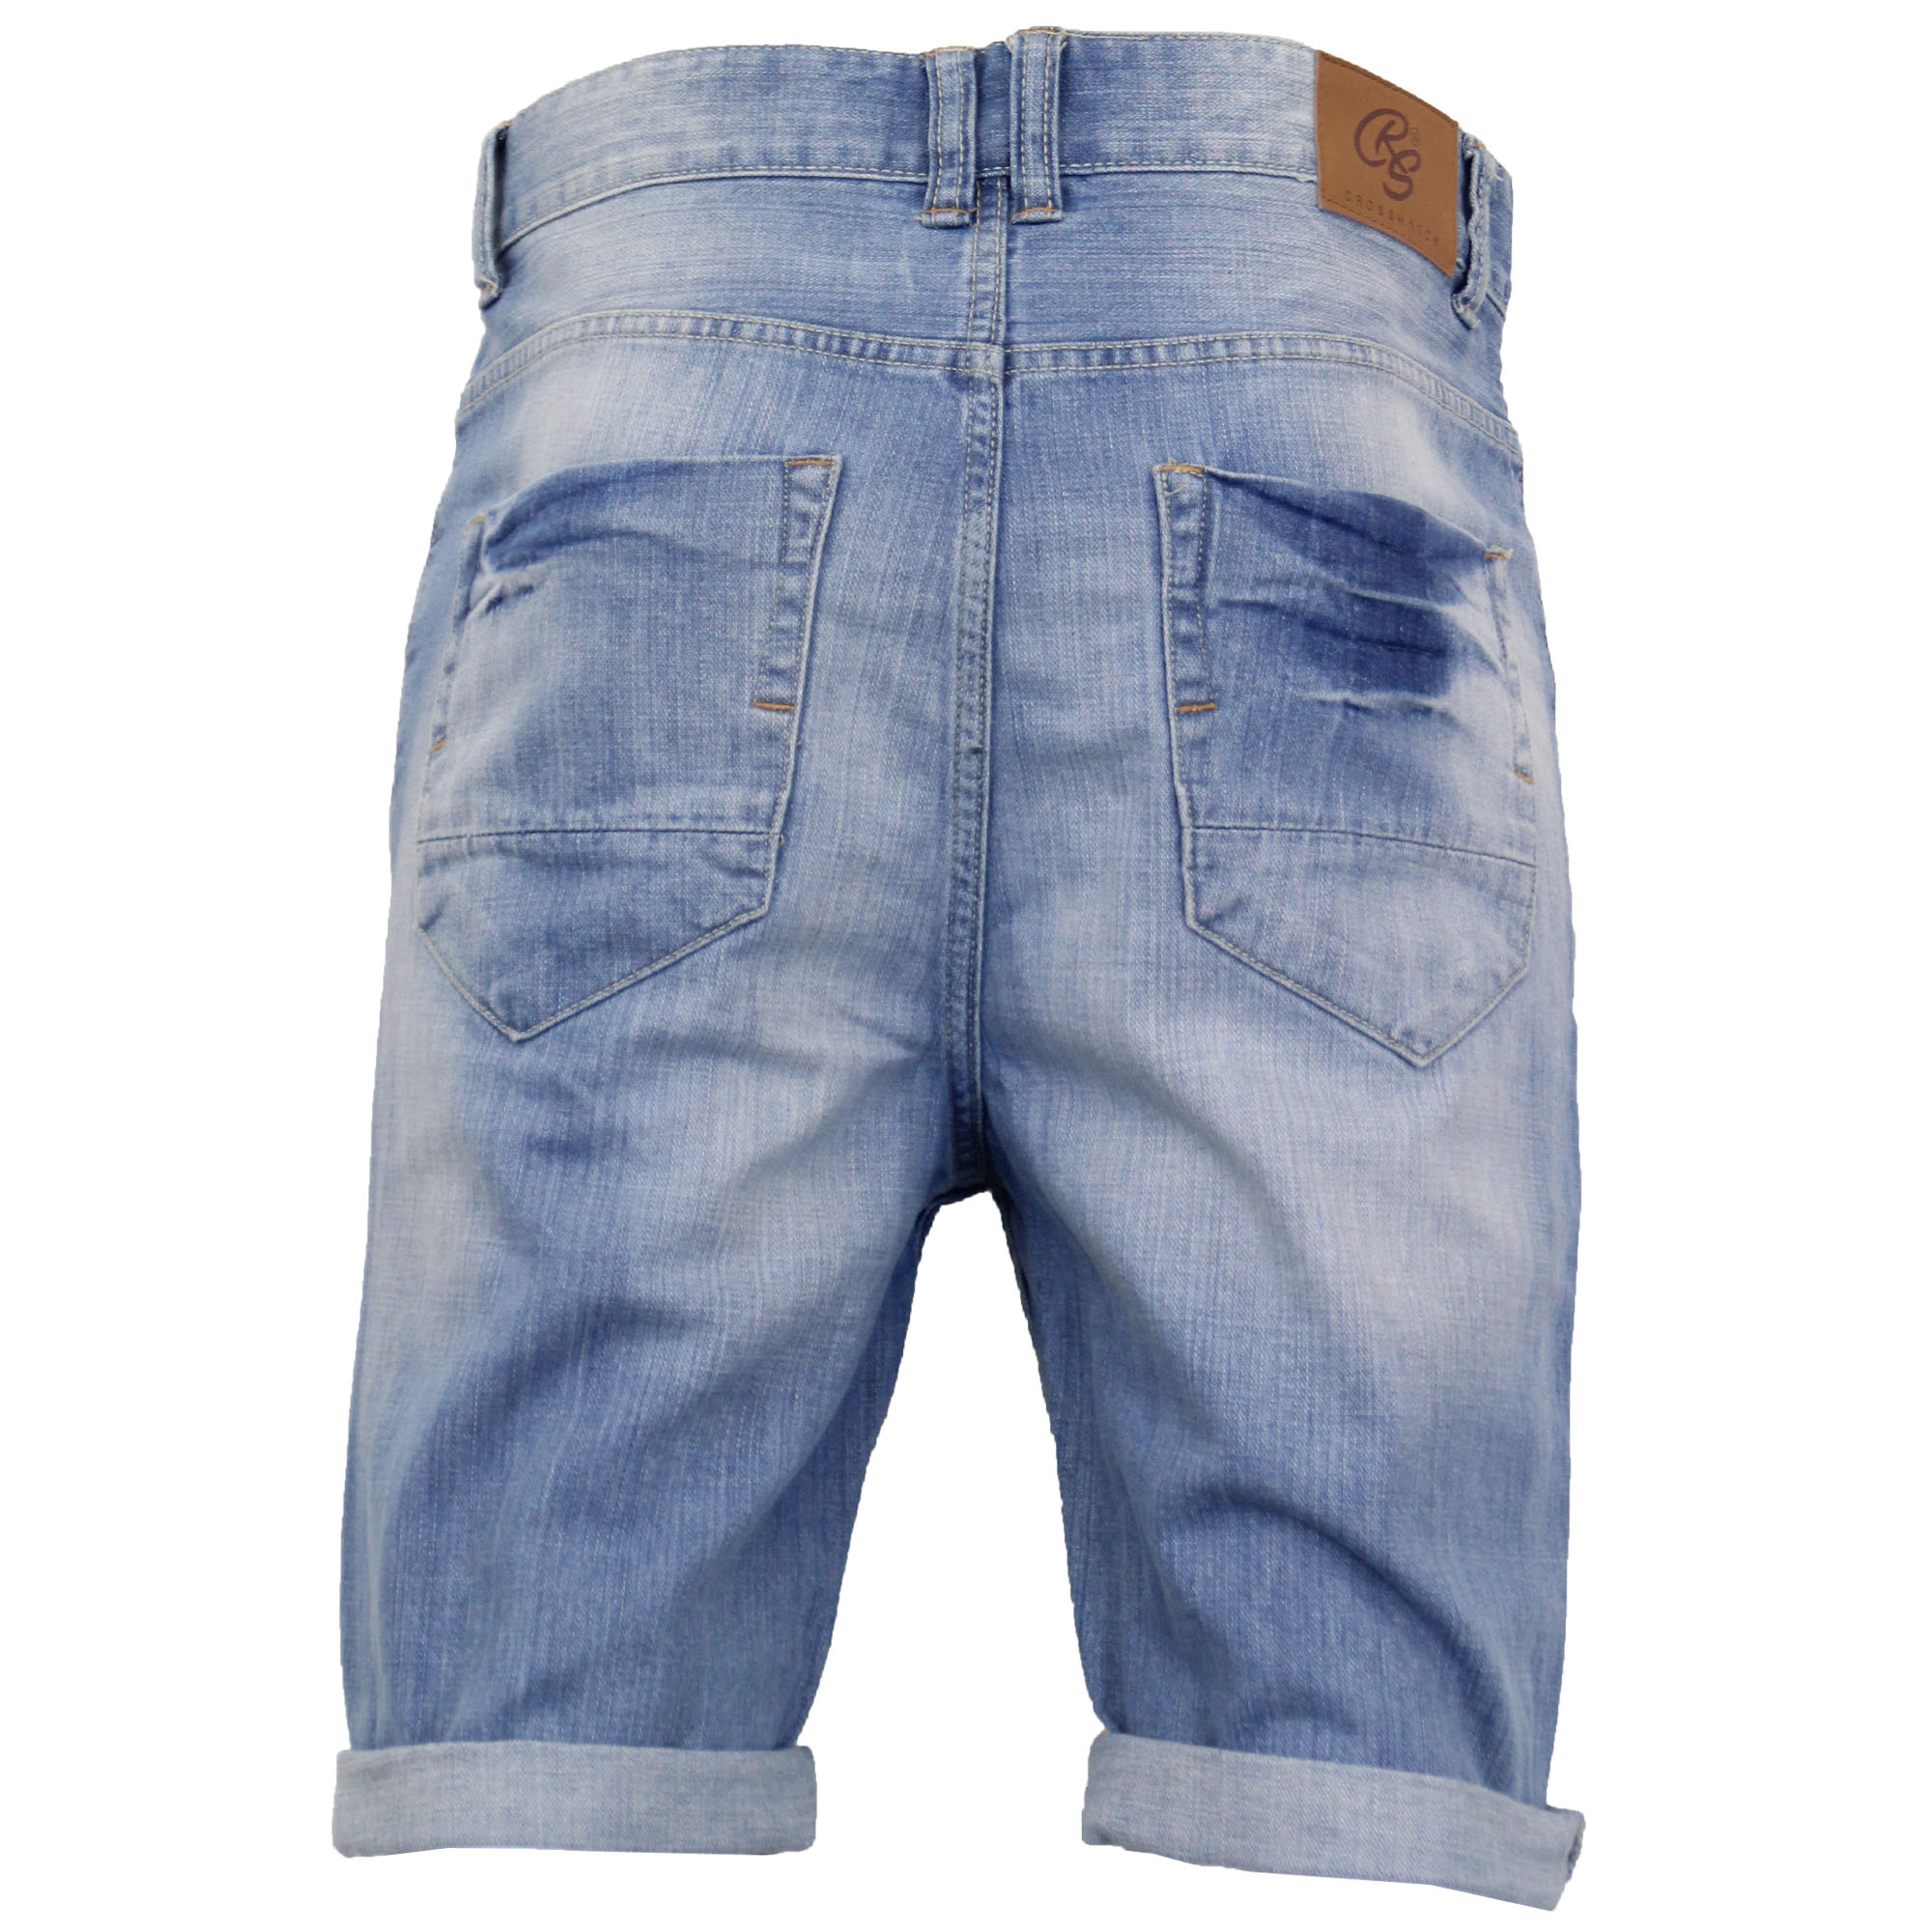 Mens-Crosshatch-Denim-Knee-Length-Combat-Shorts-Cargo-Casual-Fashion-Summer-New 縮圖 46